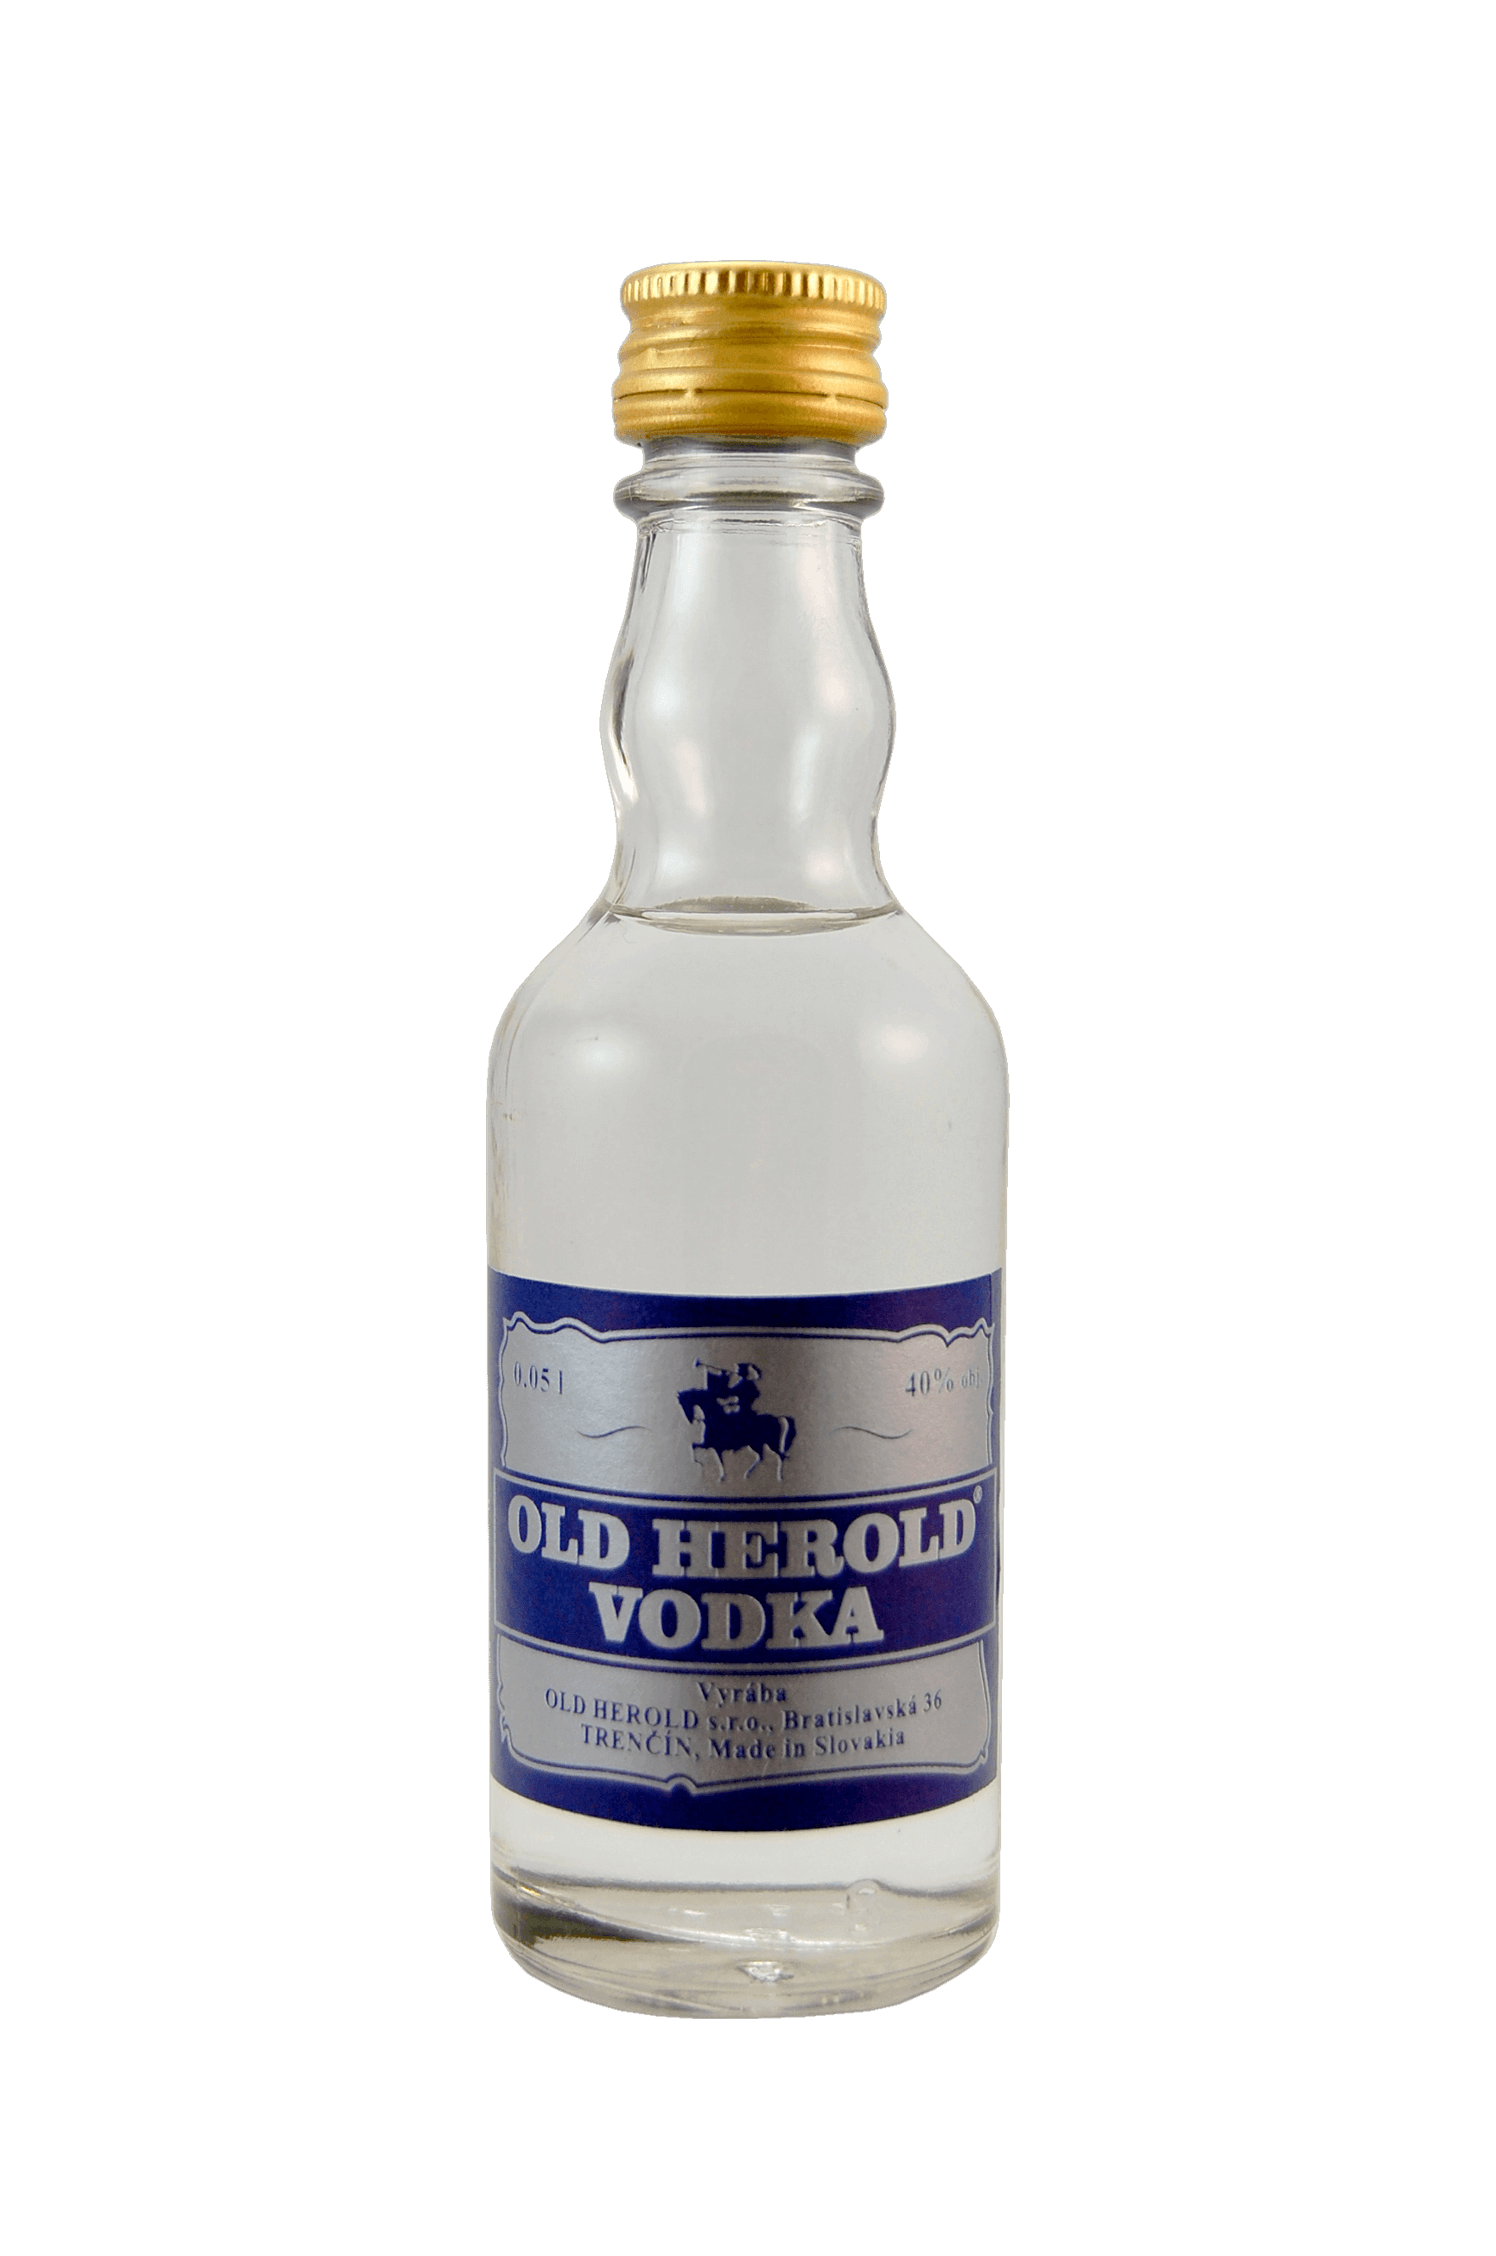 Old Herold Vodka